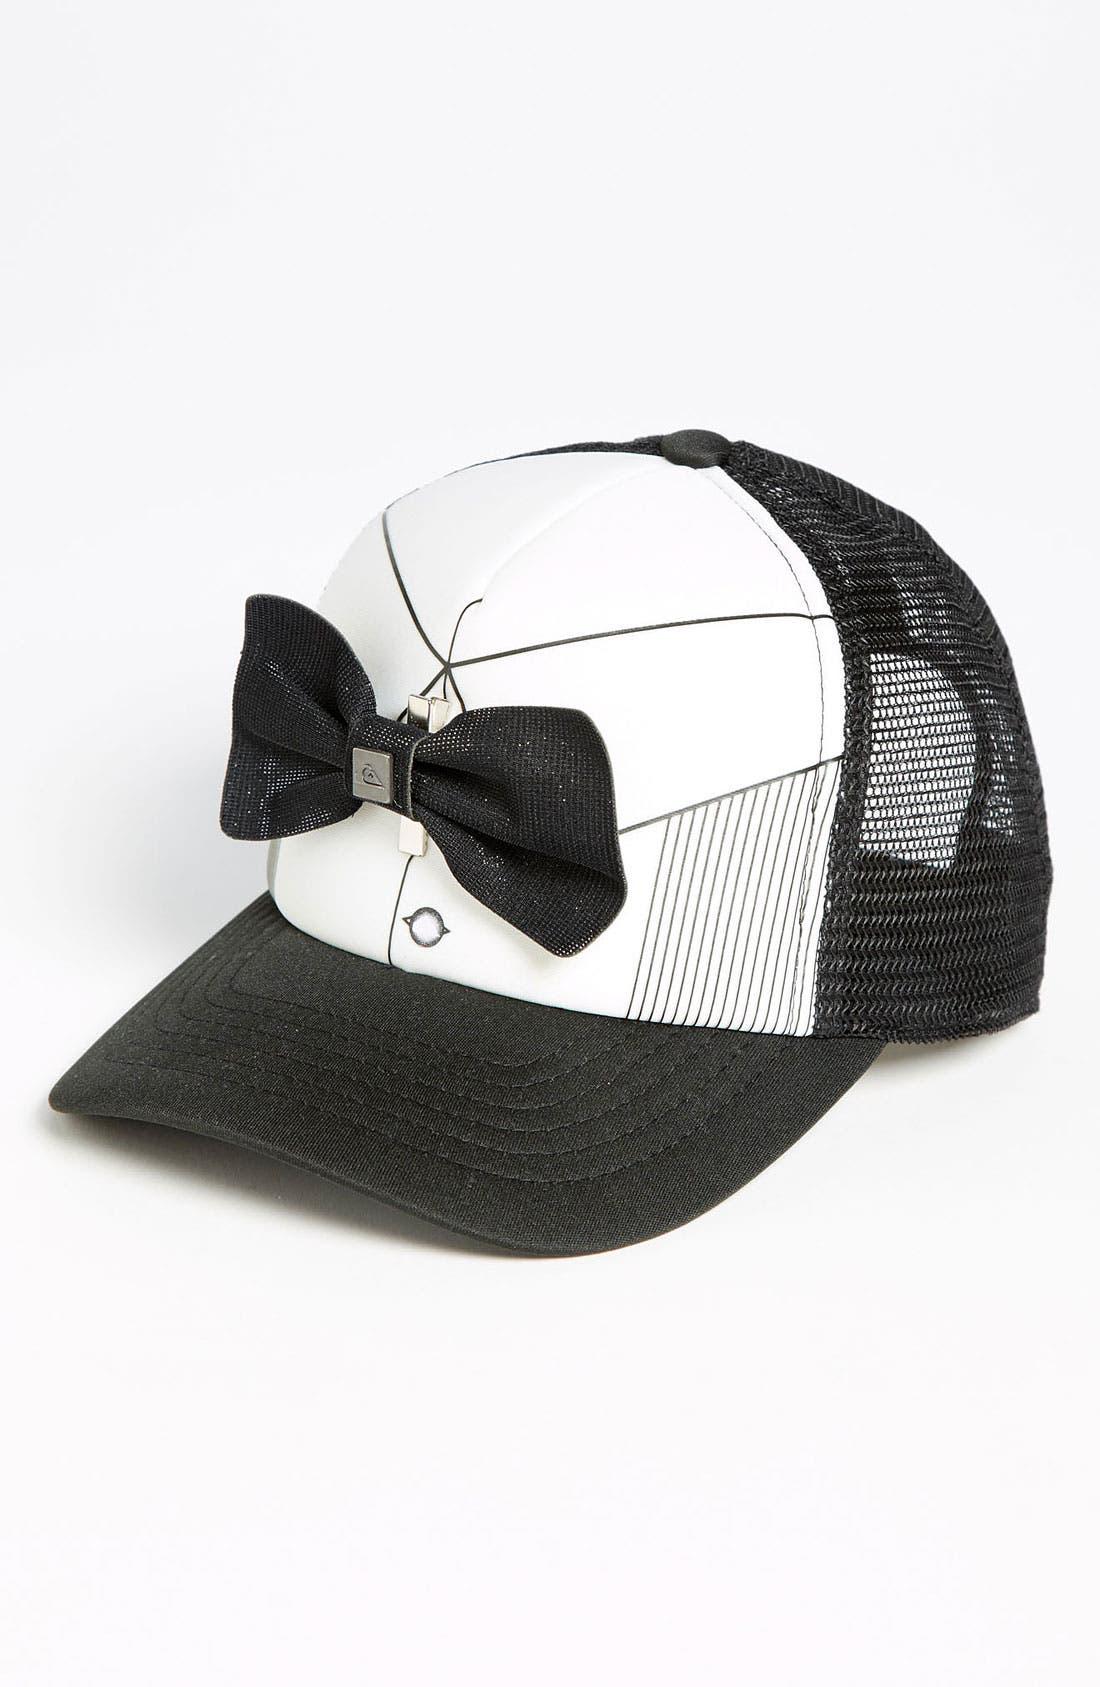 Alternate Image 1 Selected - Quiksilver 'Diggler' Trucker Hat (Boys)